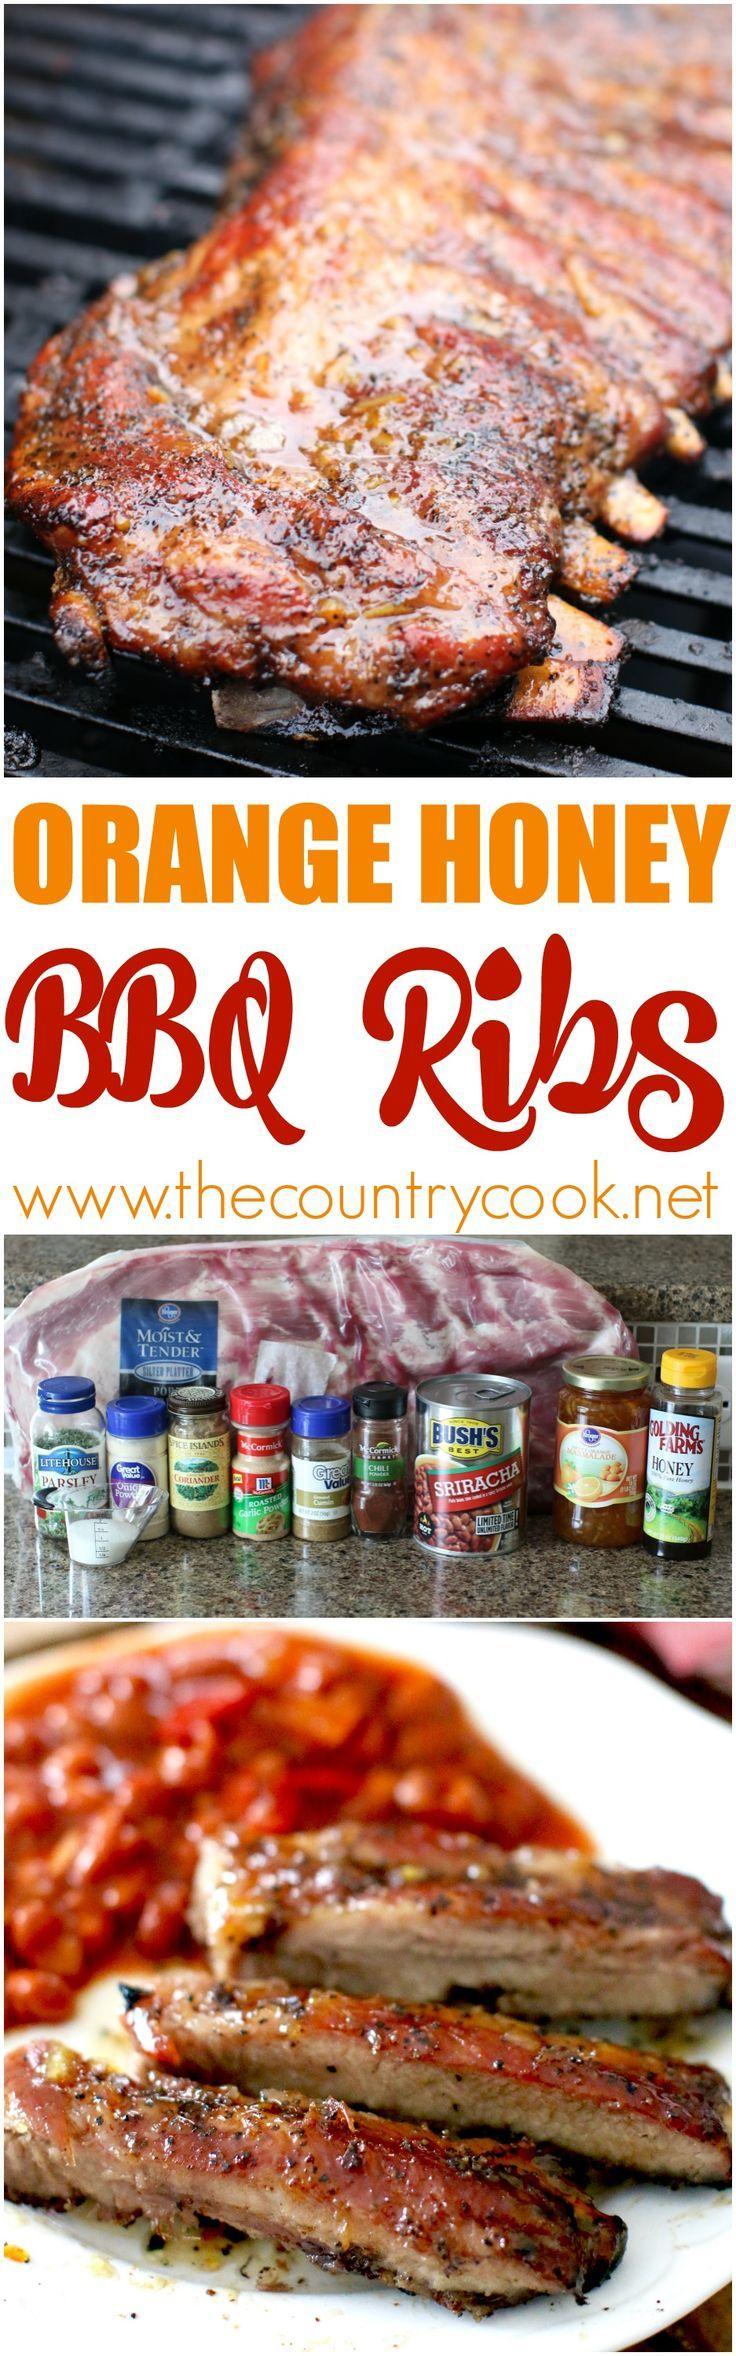 Bbq Bourbon Beef Ribs Tiny Kitchen Club Honey Recipes Beef Ribs Honey Bbq